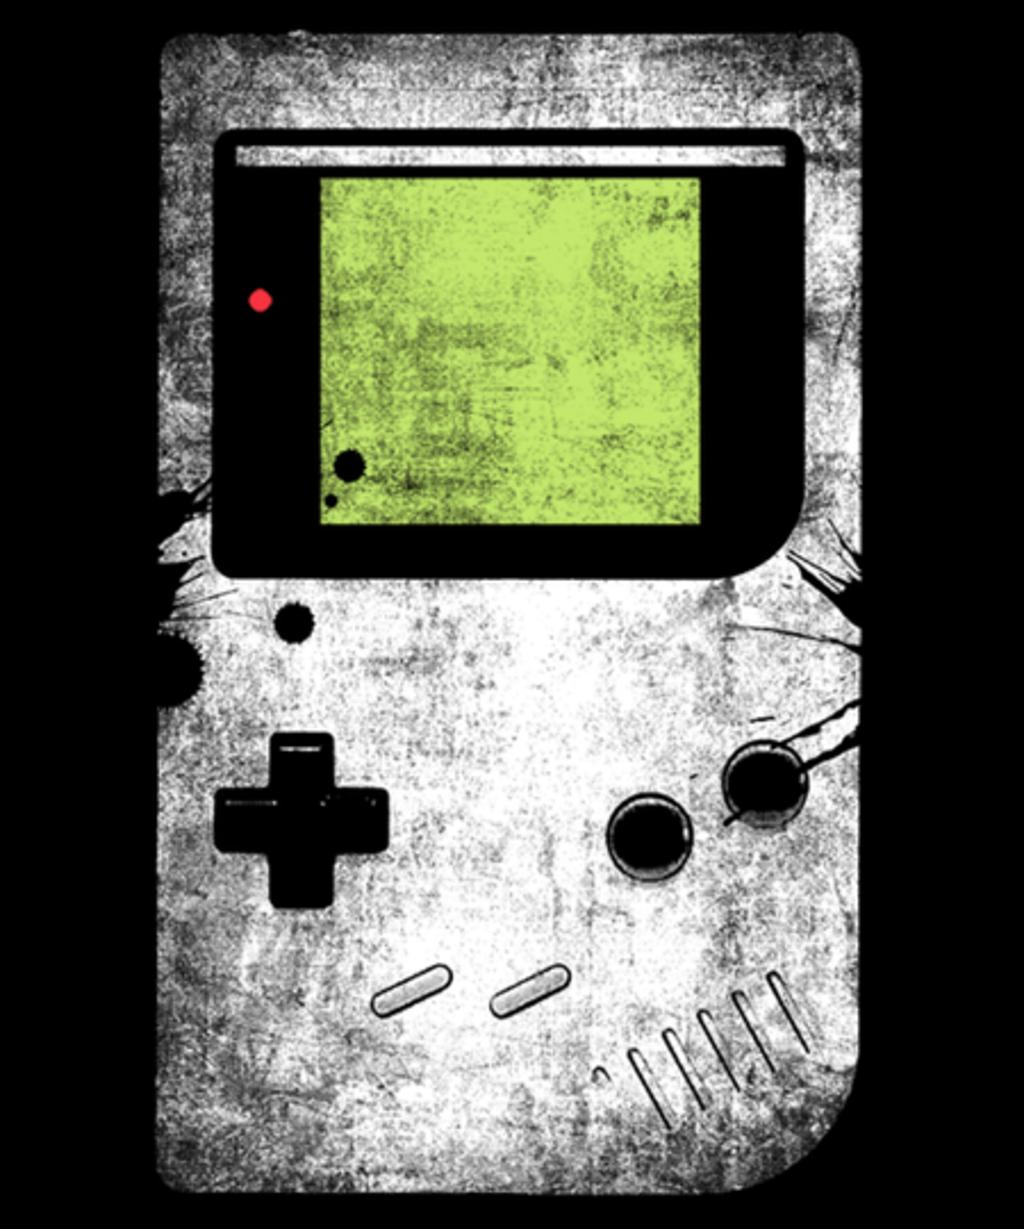 Qwertee: retro gamer